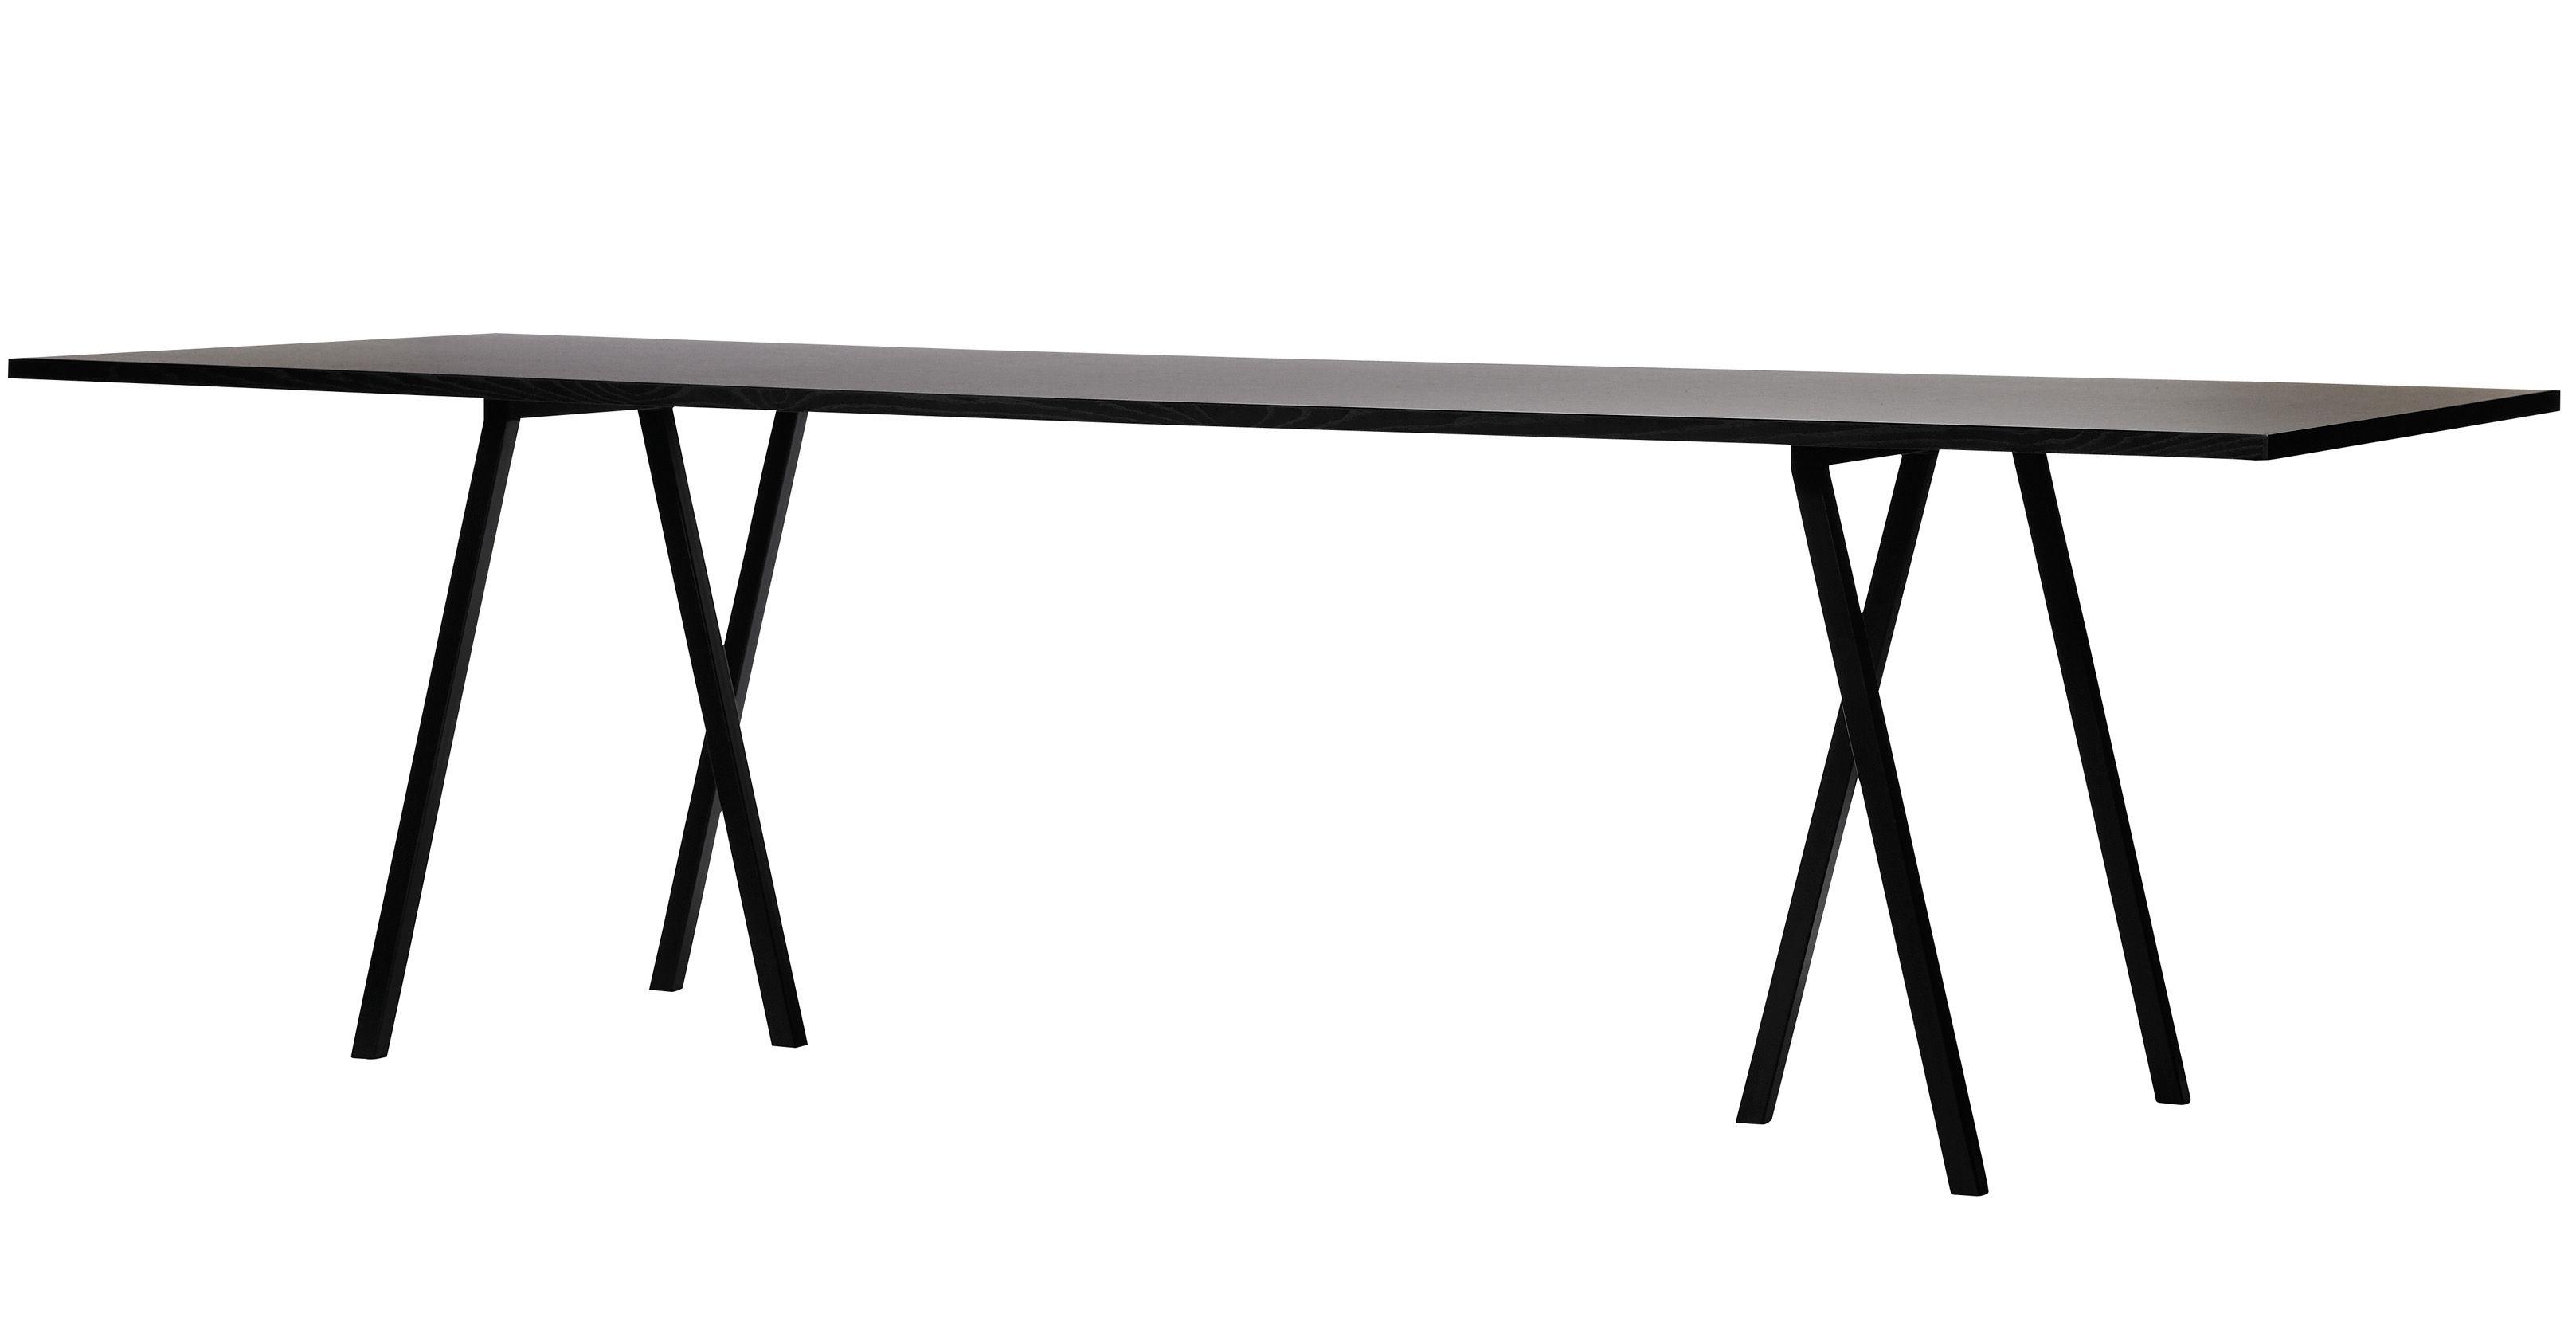 Rentrée 2011 UK - Must-have - Tavolo Loop - L 180 cm di Hay - L 180 cm - Nero - Acciaio laccato